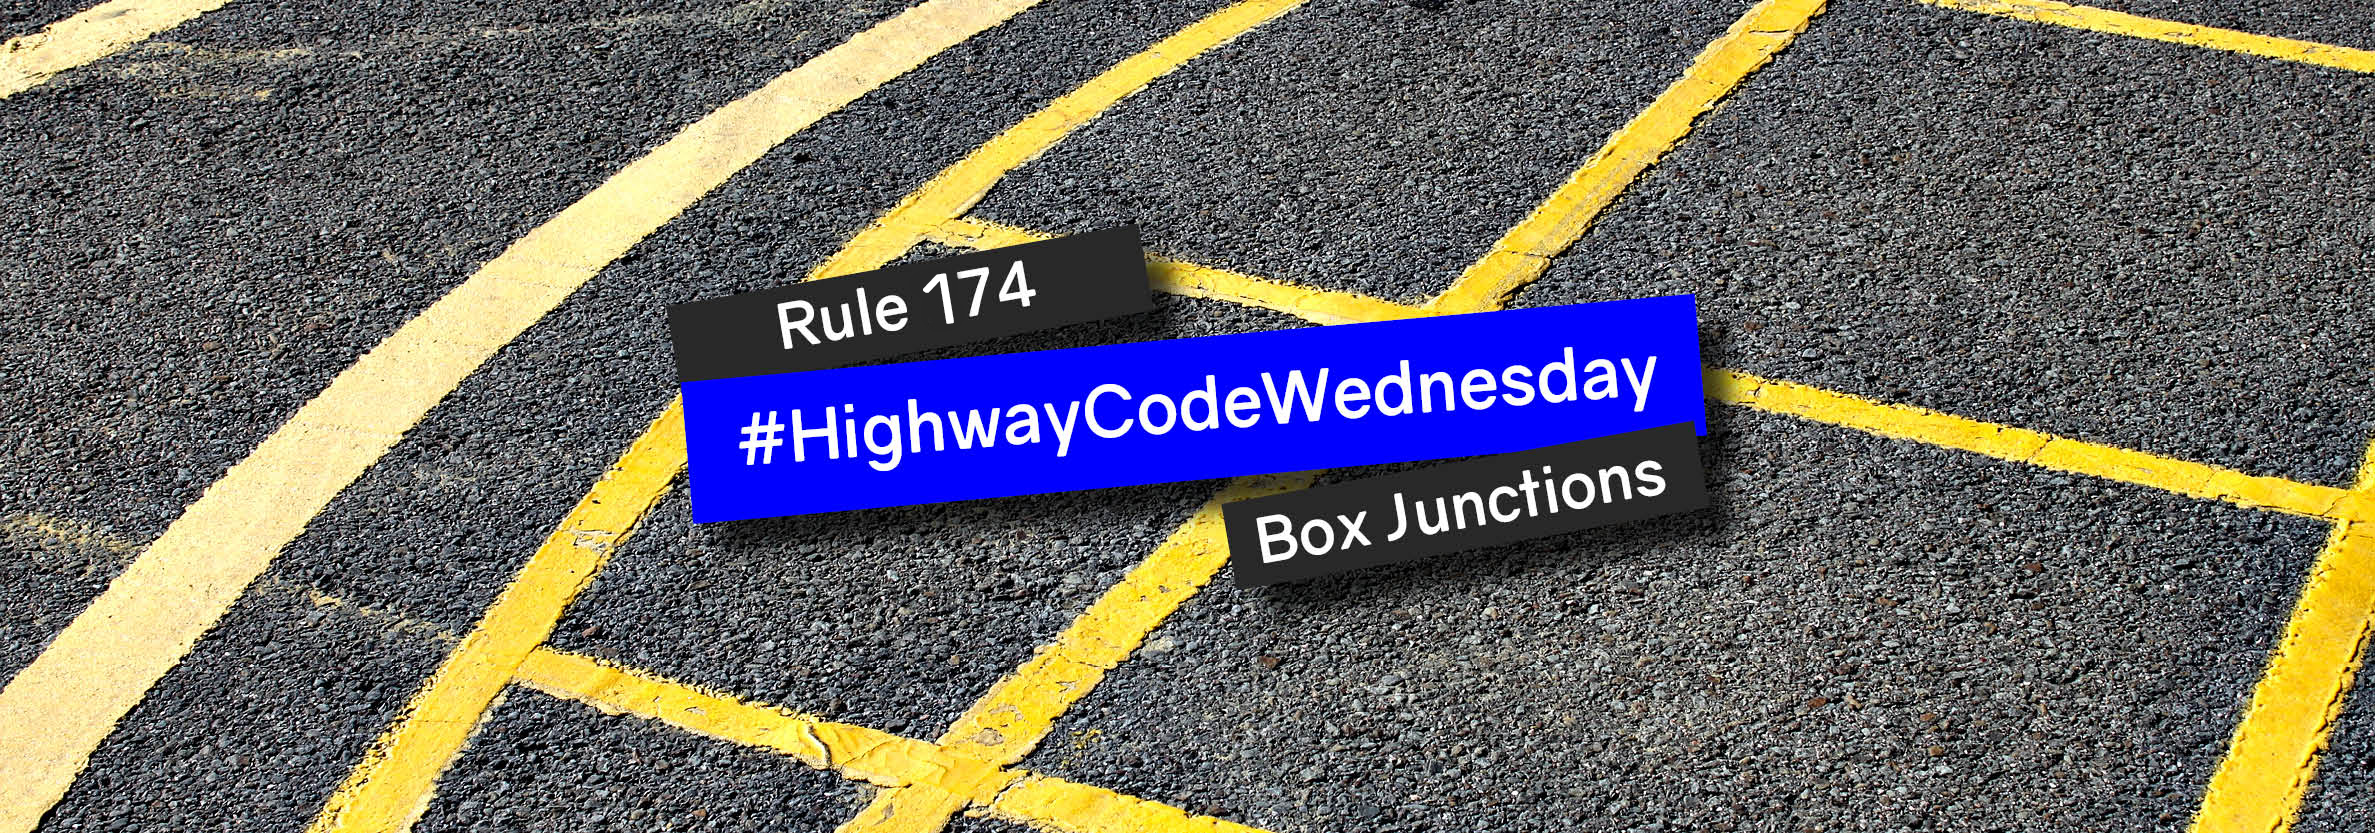 Rule 174 Main Image